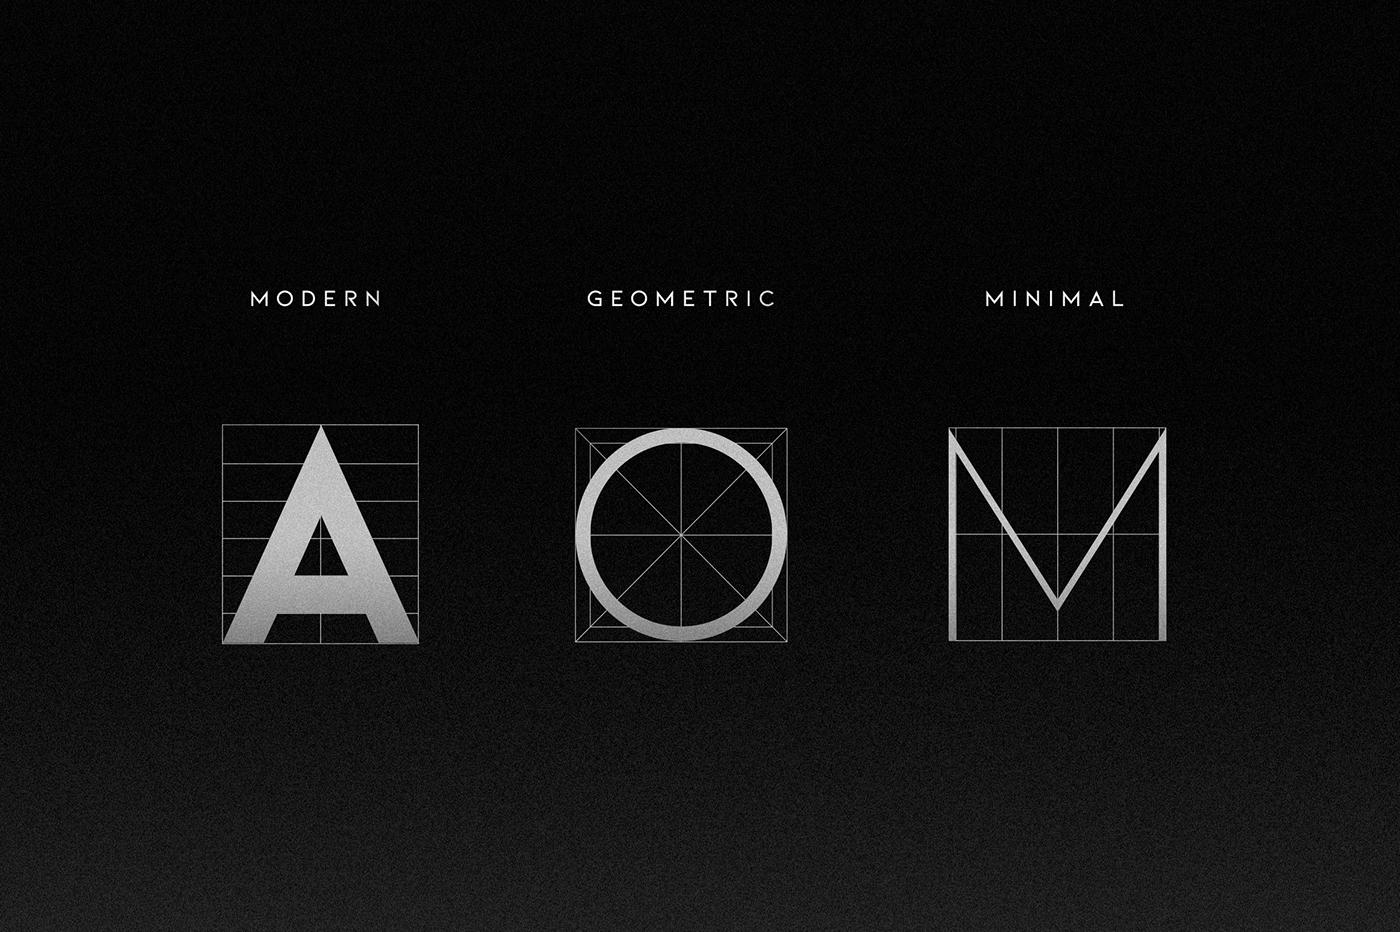 KIONA - Font Family (Free Download) on Behance